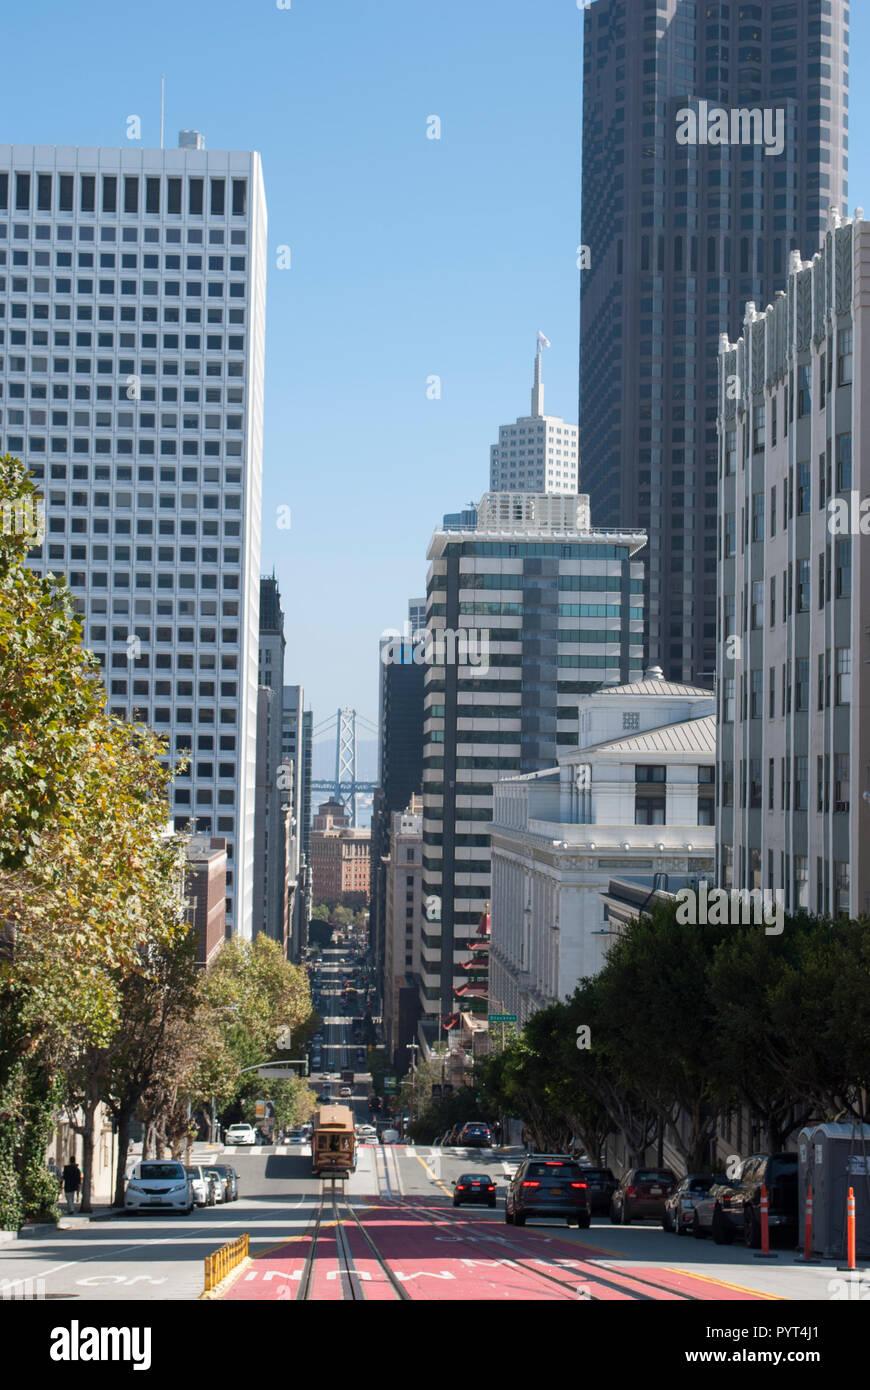 San Francisco downtown. Modern and retro architecture. Stock Photo